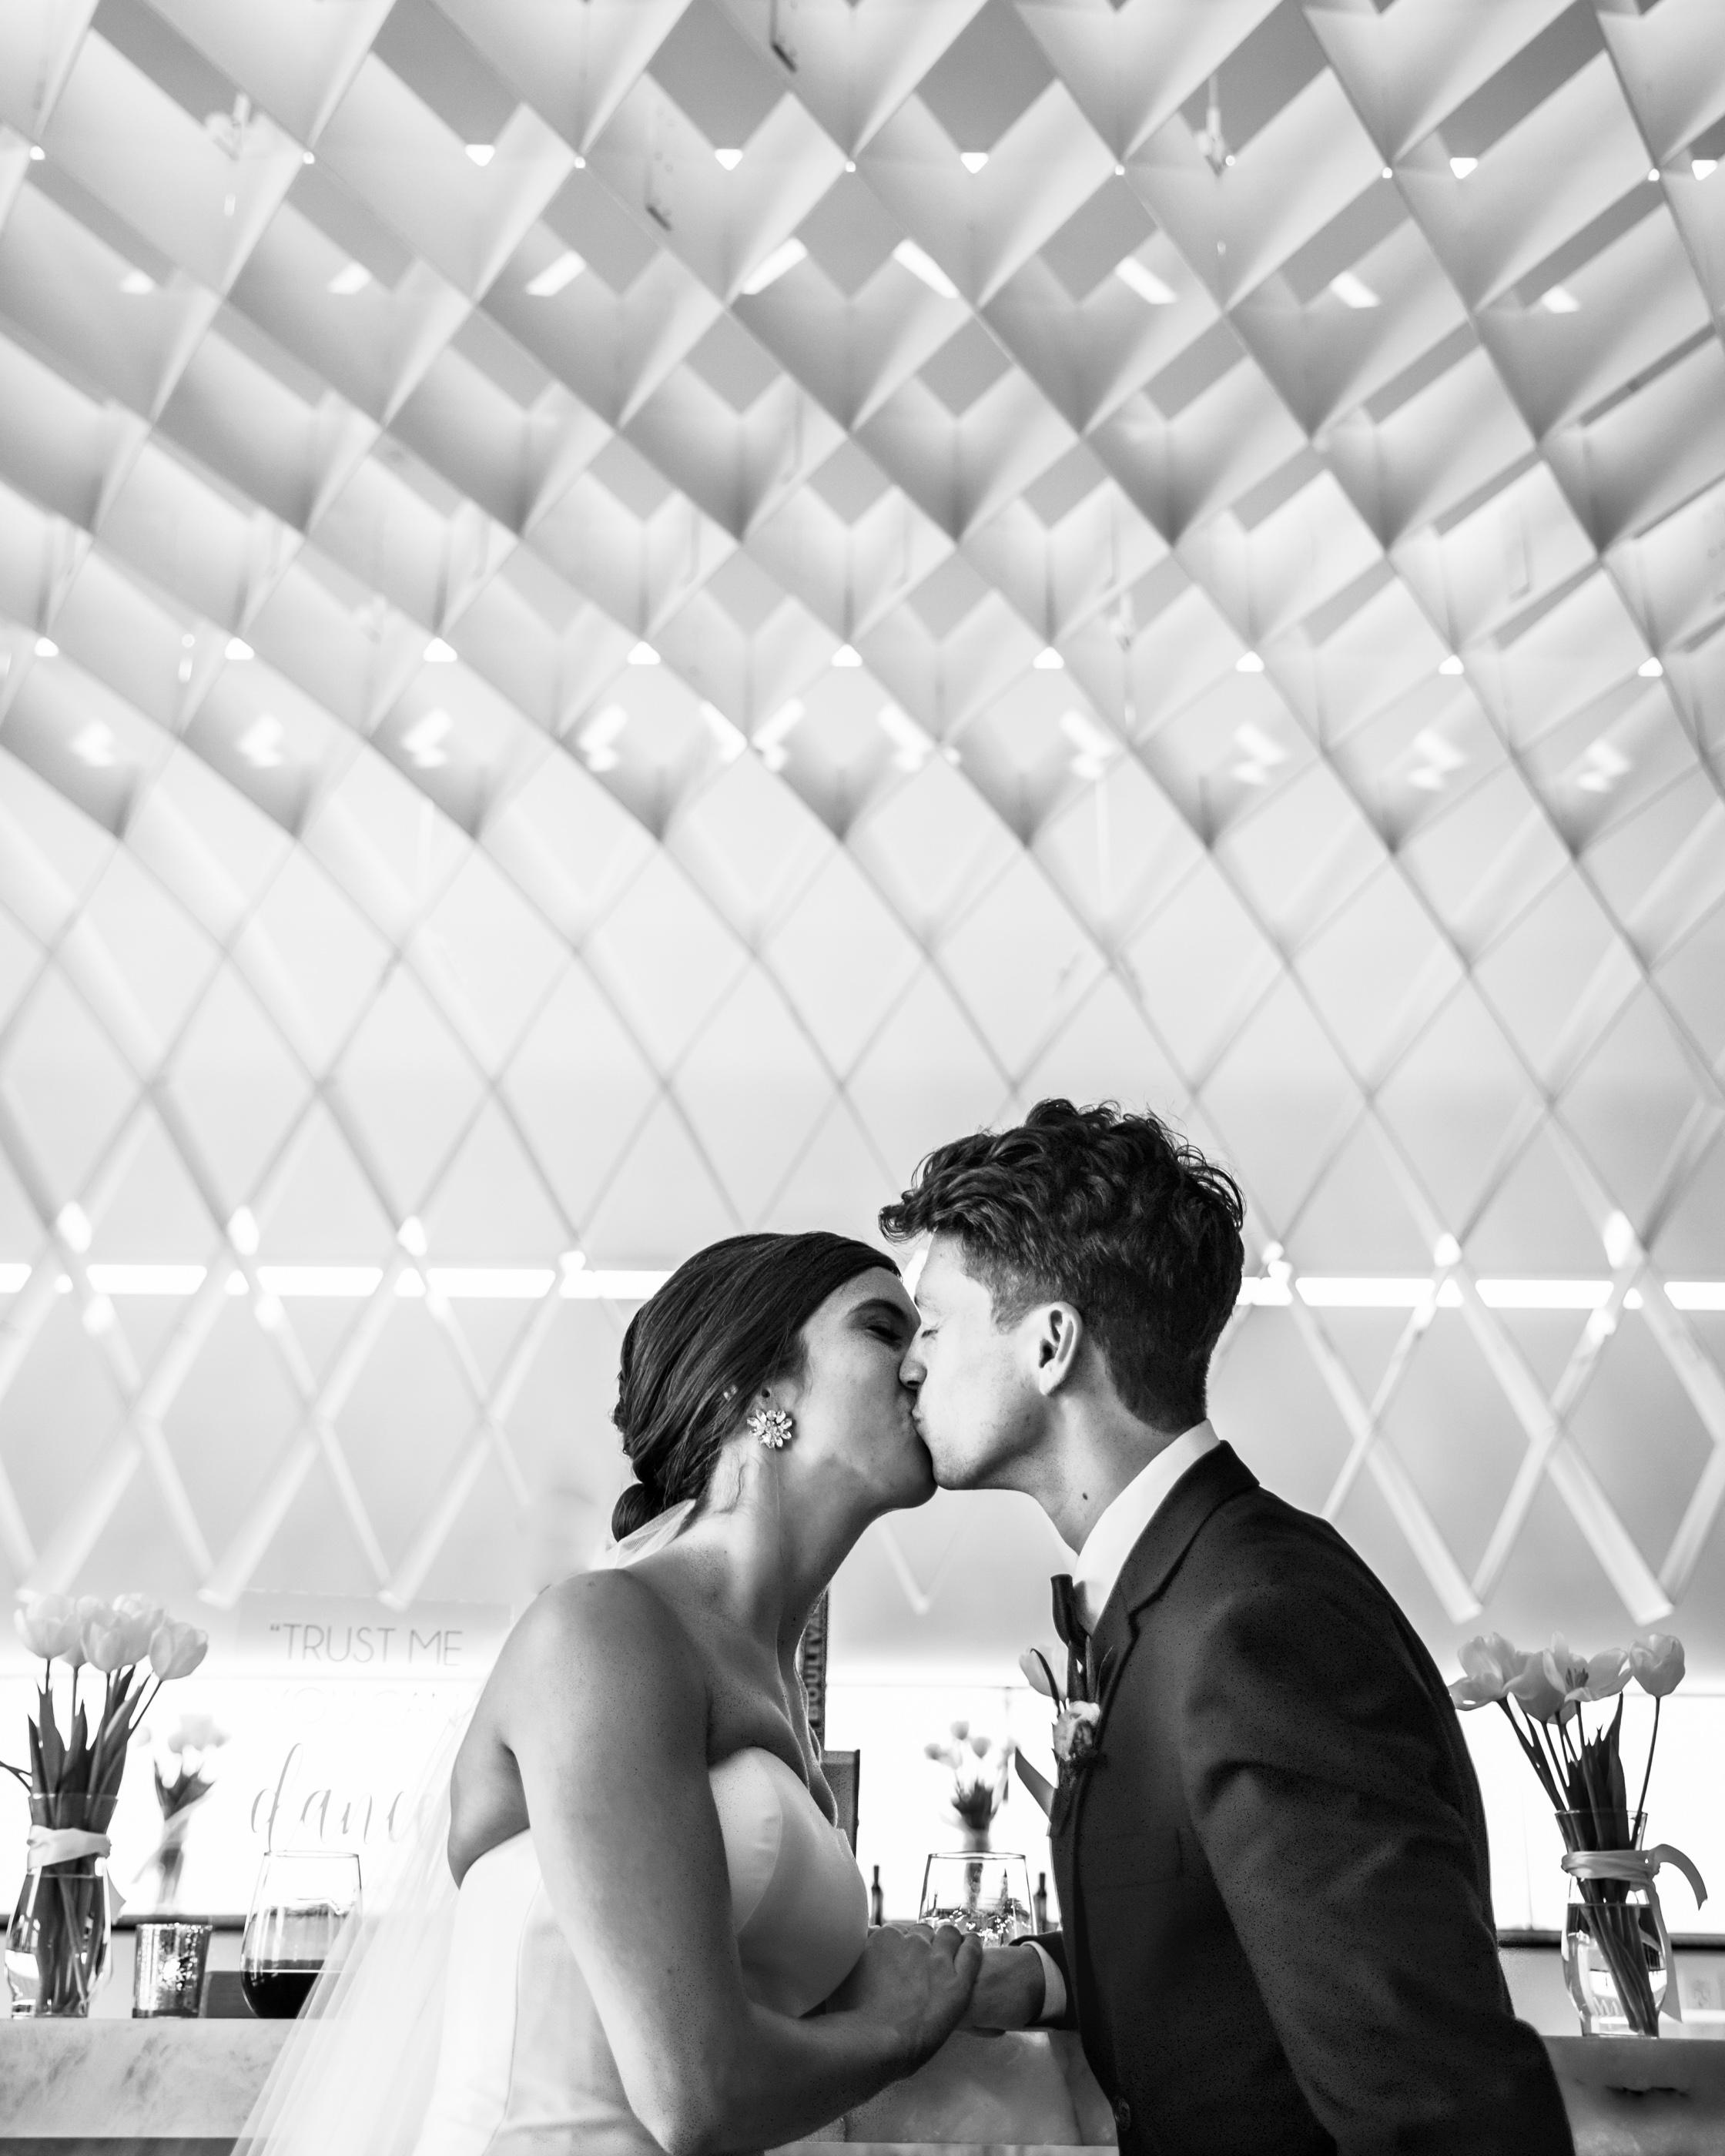 Brass on Baltimore_Kindling Wedding Photography_8.JPG